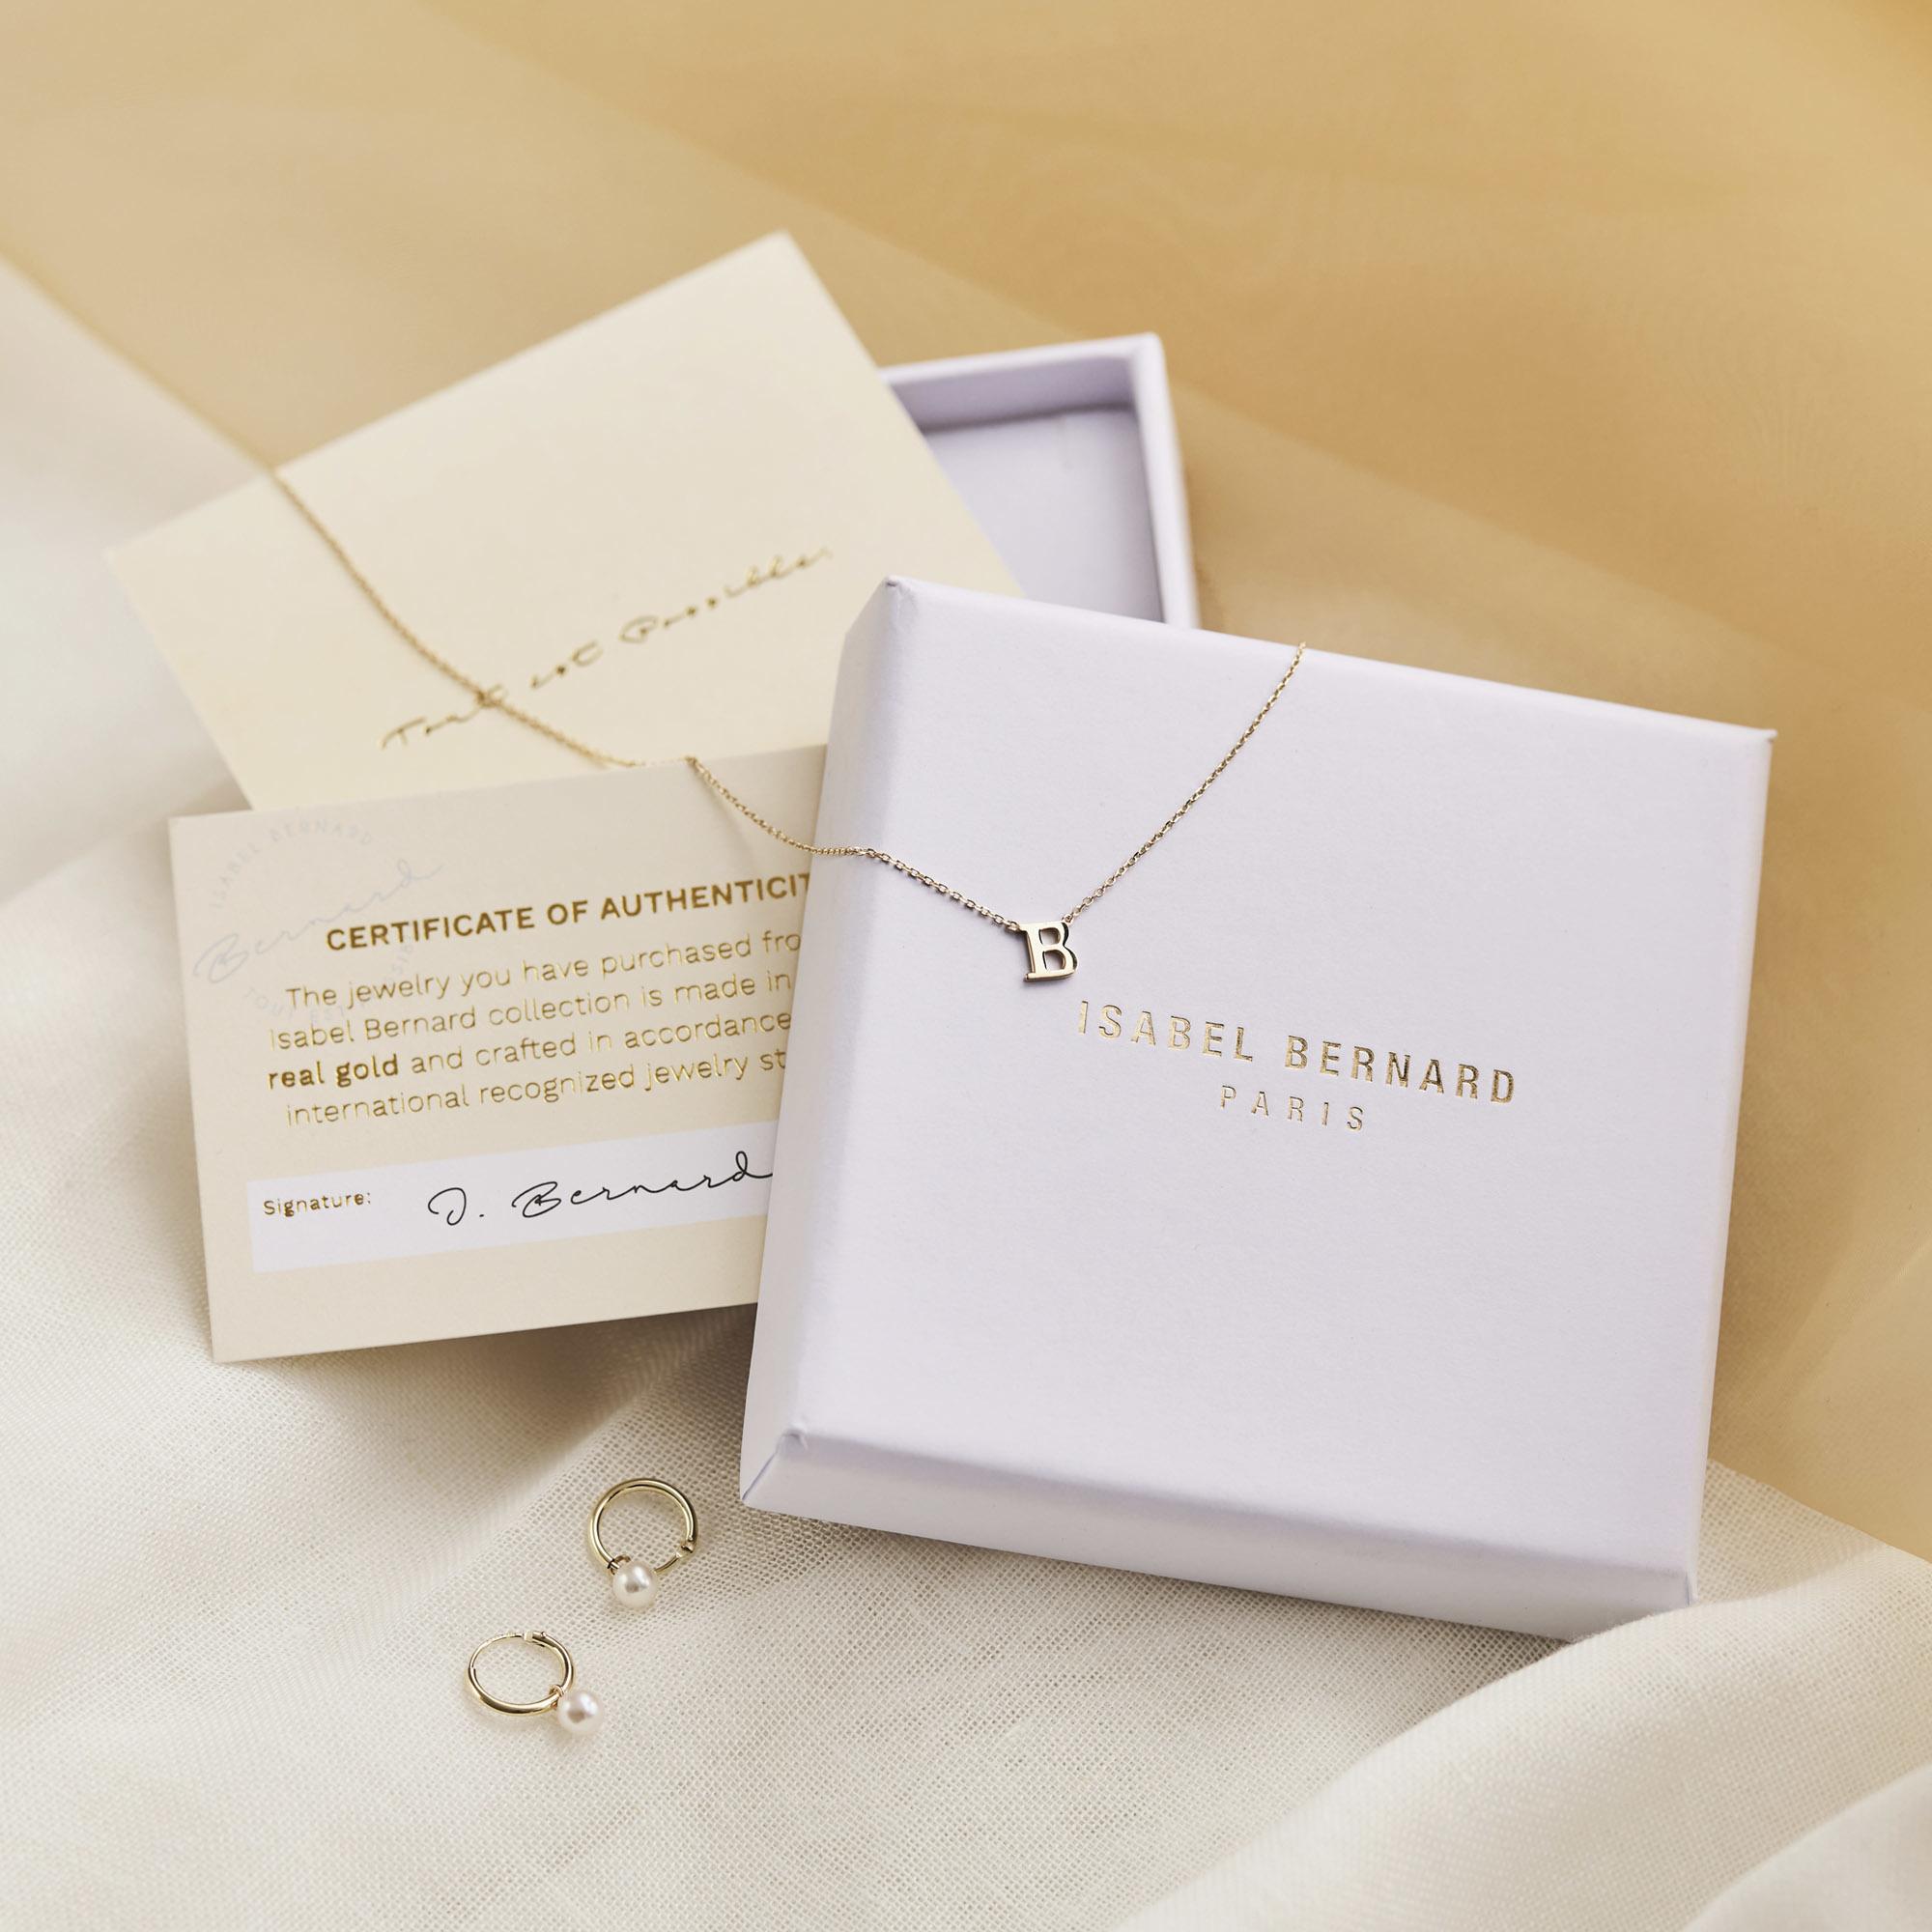 Isabel Bernard Saint Germain Guillaine 14 karat white gold initial single ear stud with letter